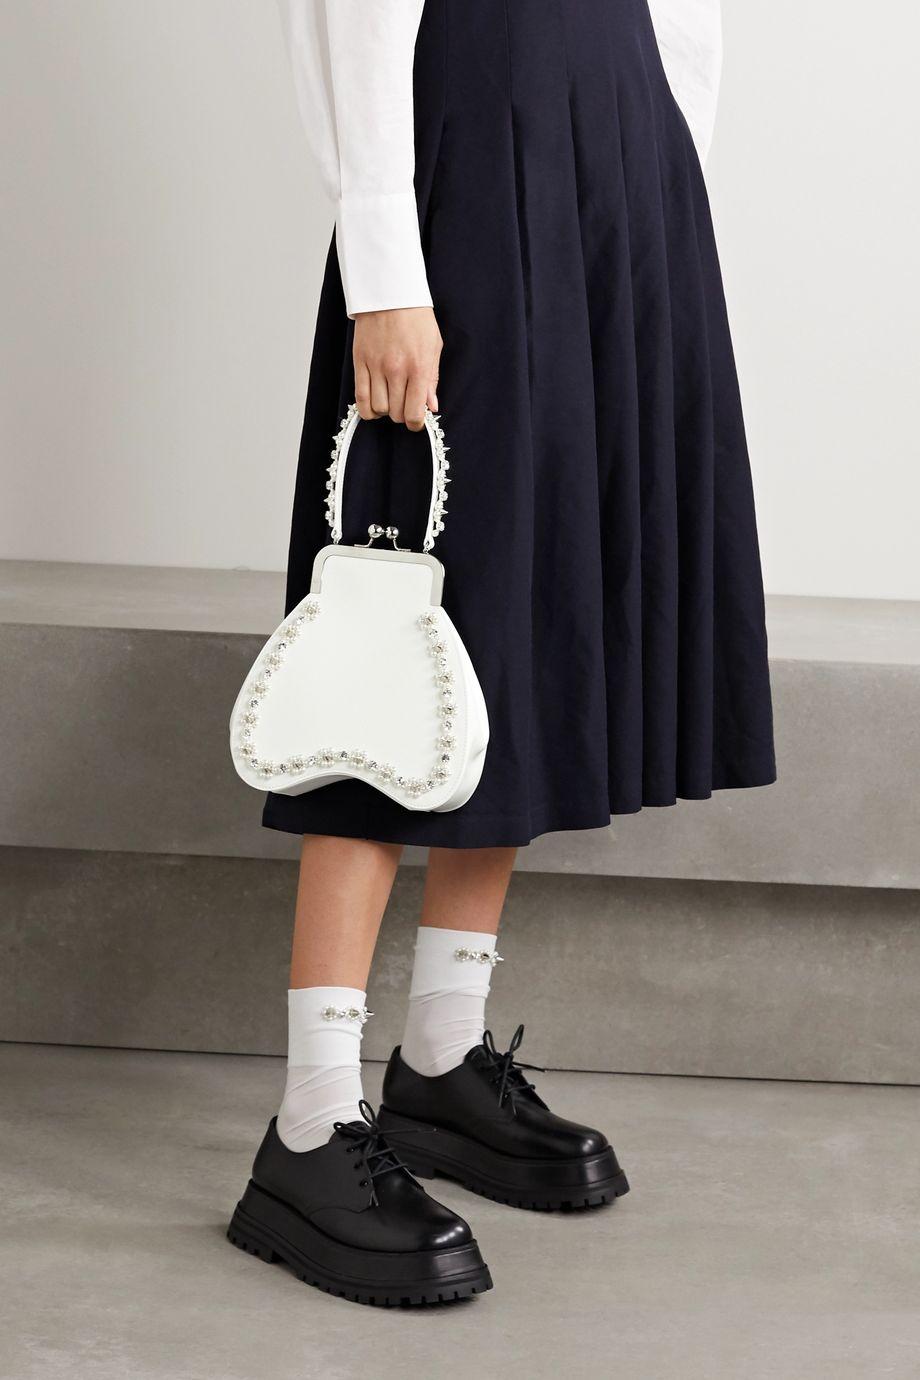 Simone Rocha Bean embellished leather tote